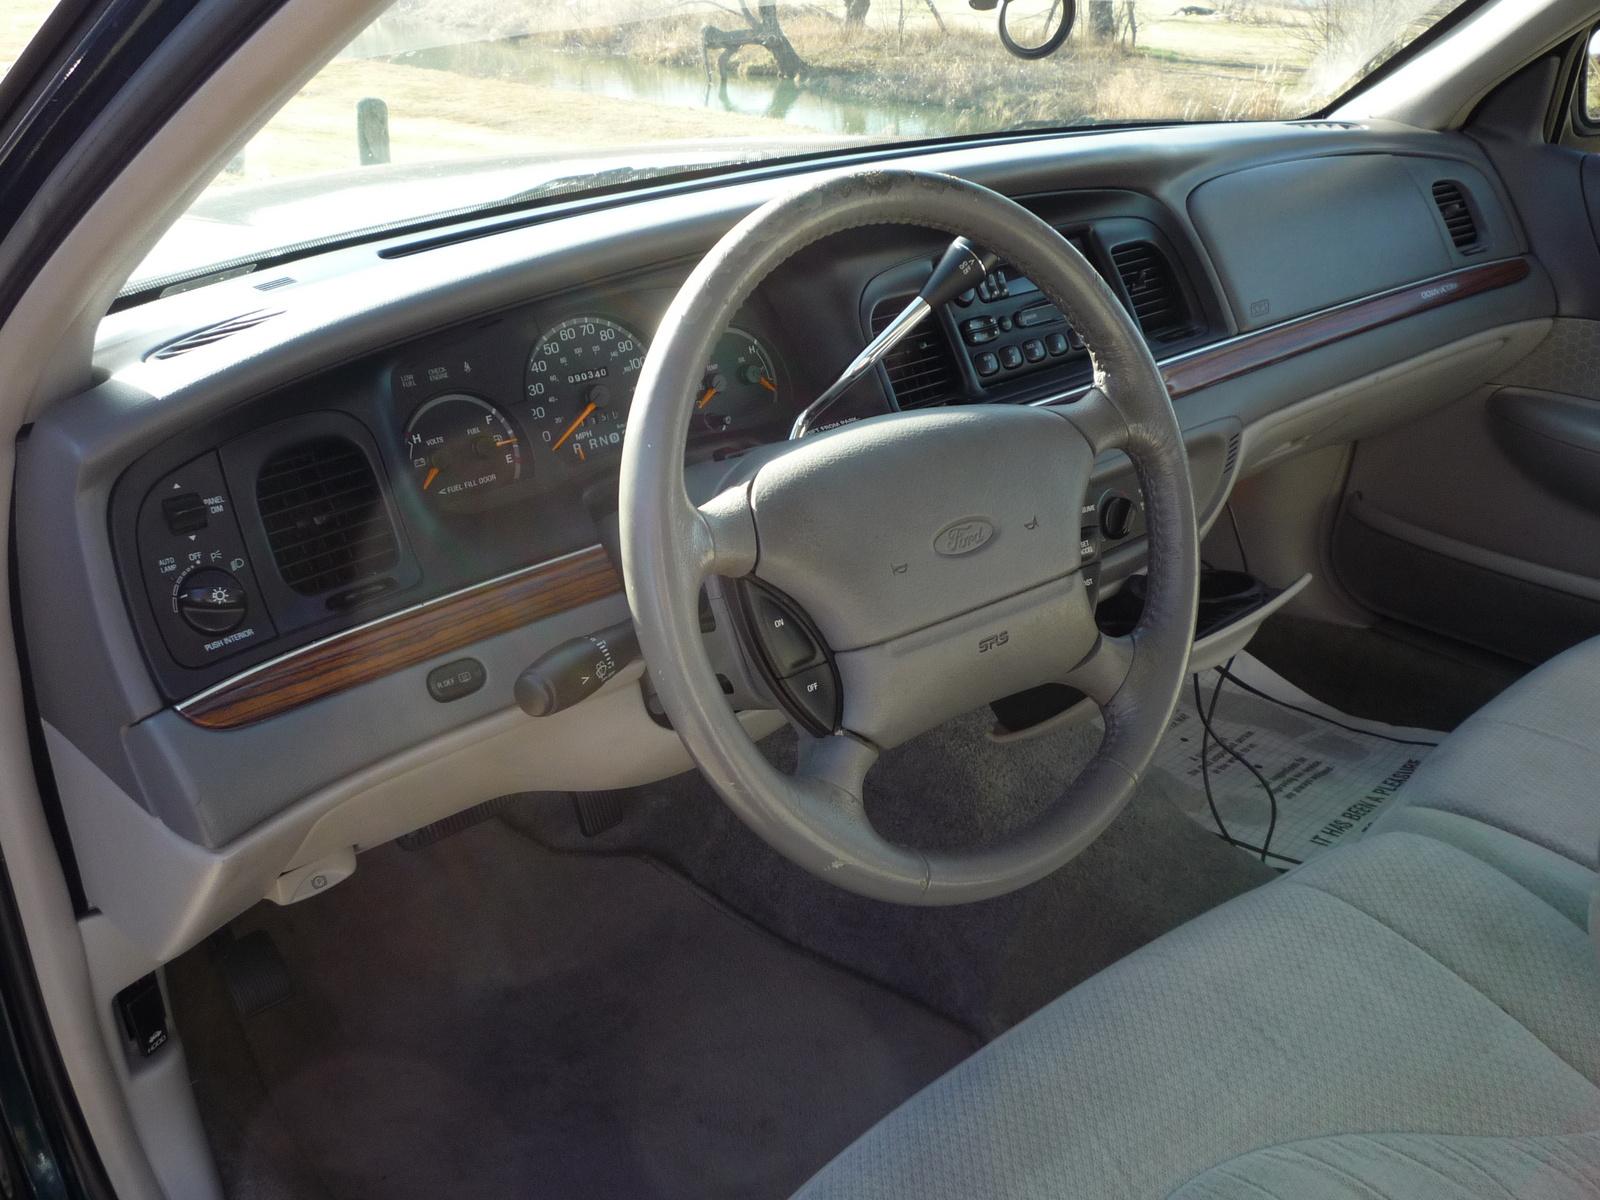 Ford Crown Victoria Dr Lx Sedan Pic